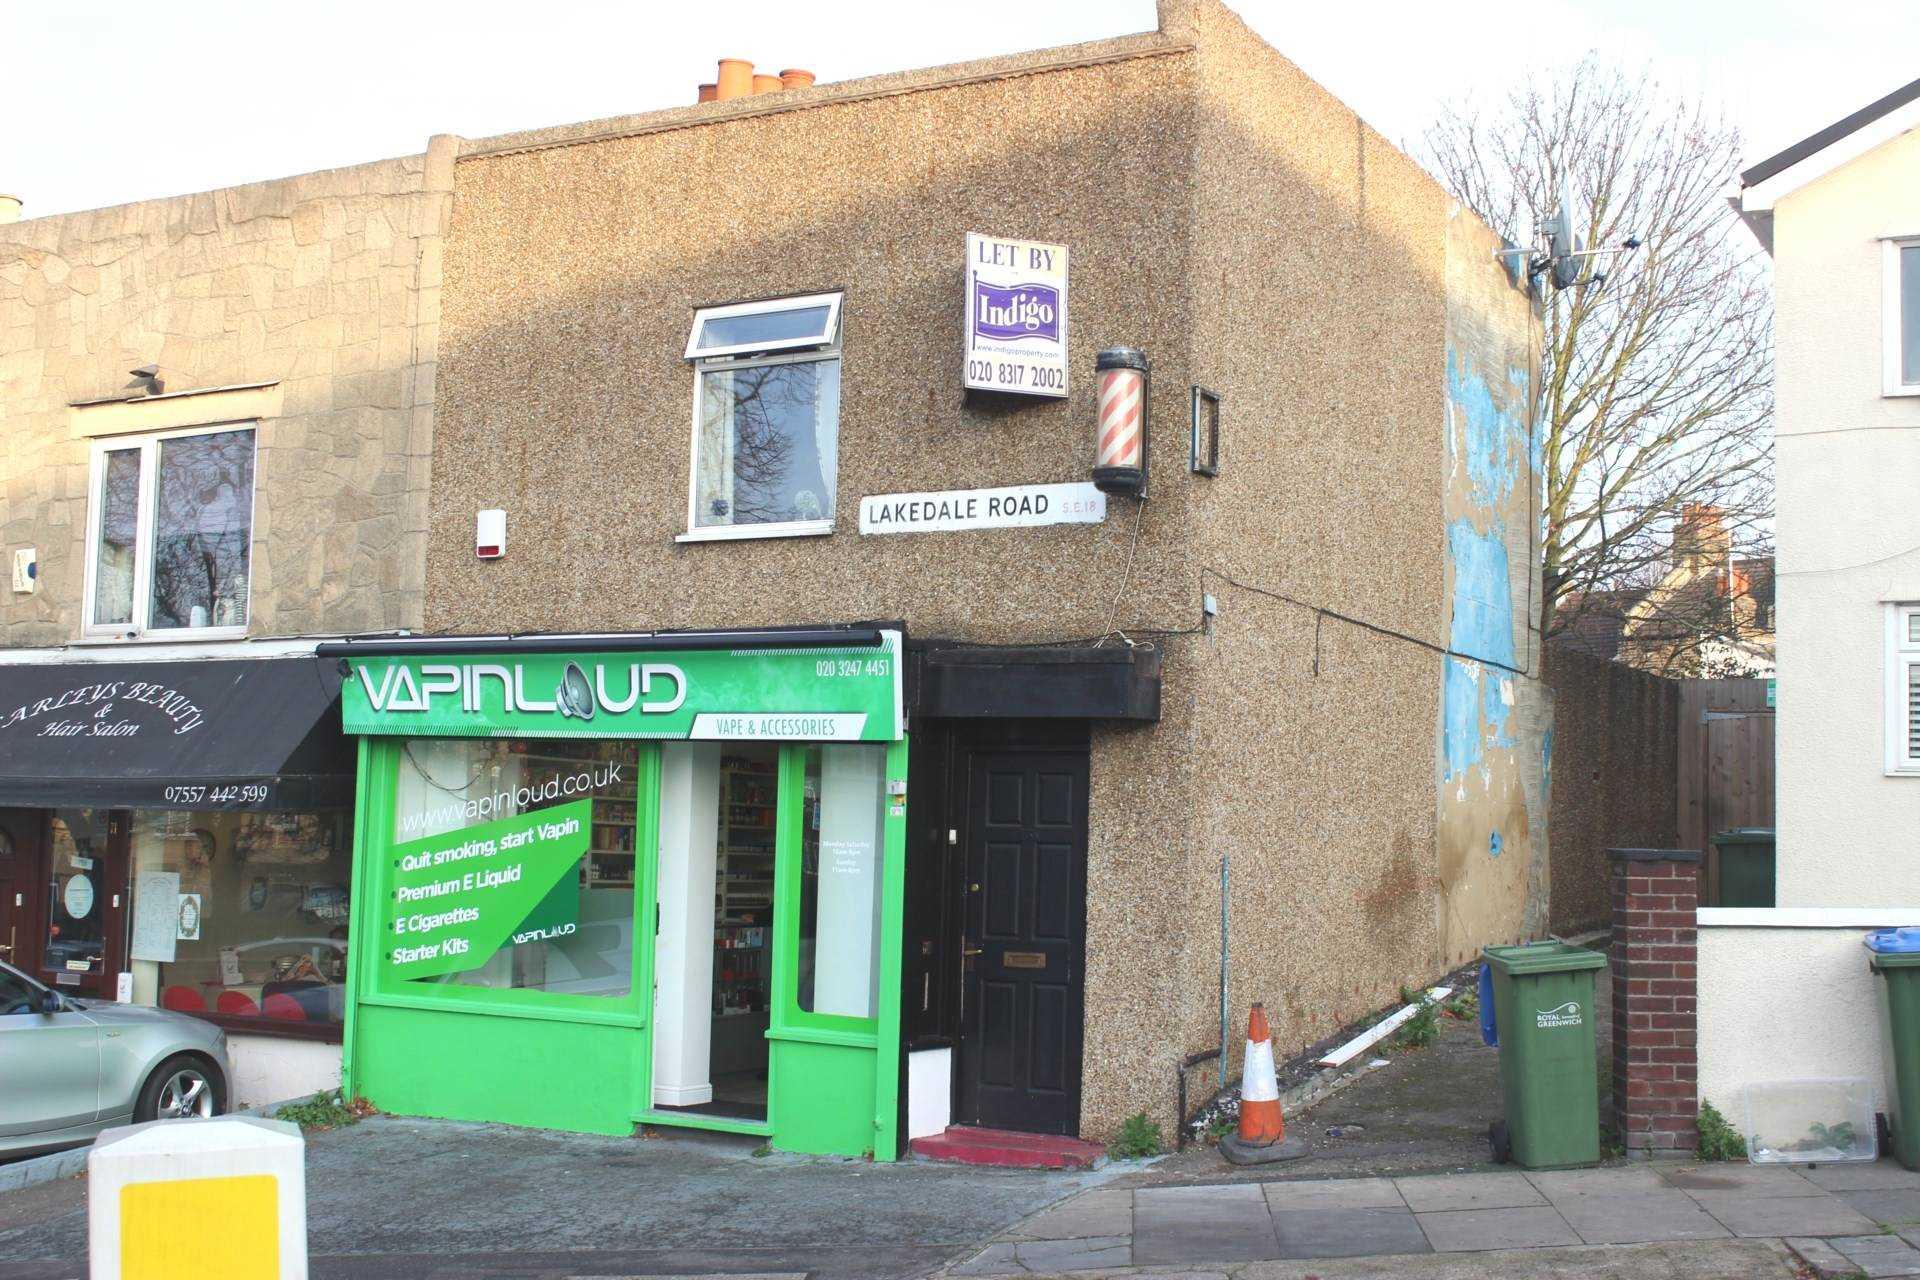 1 Bedroom Apartment To Rent Lakedale Road London Se18 1pr